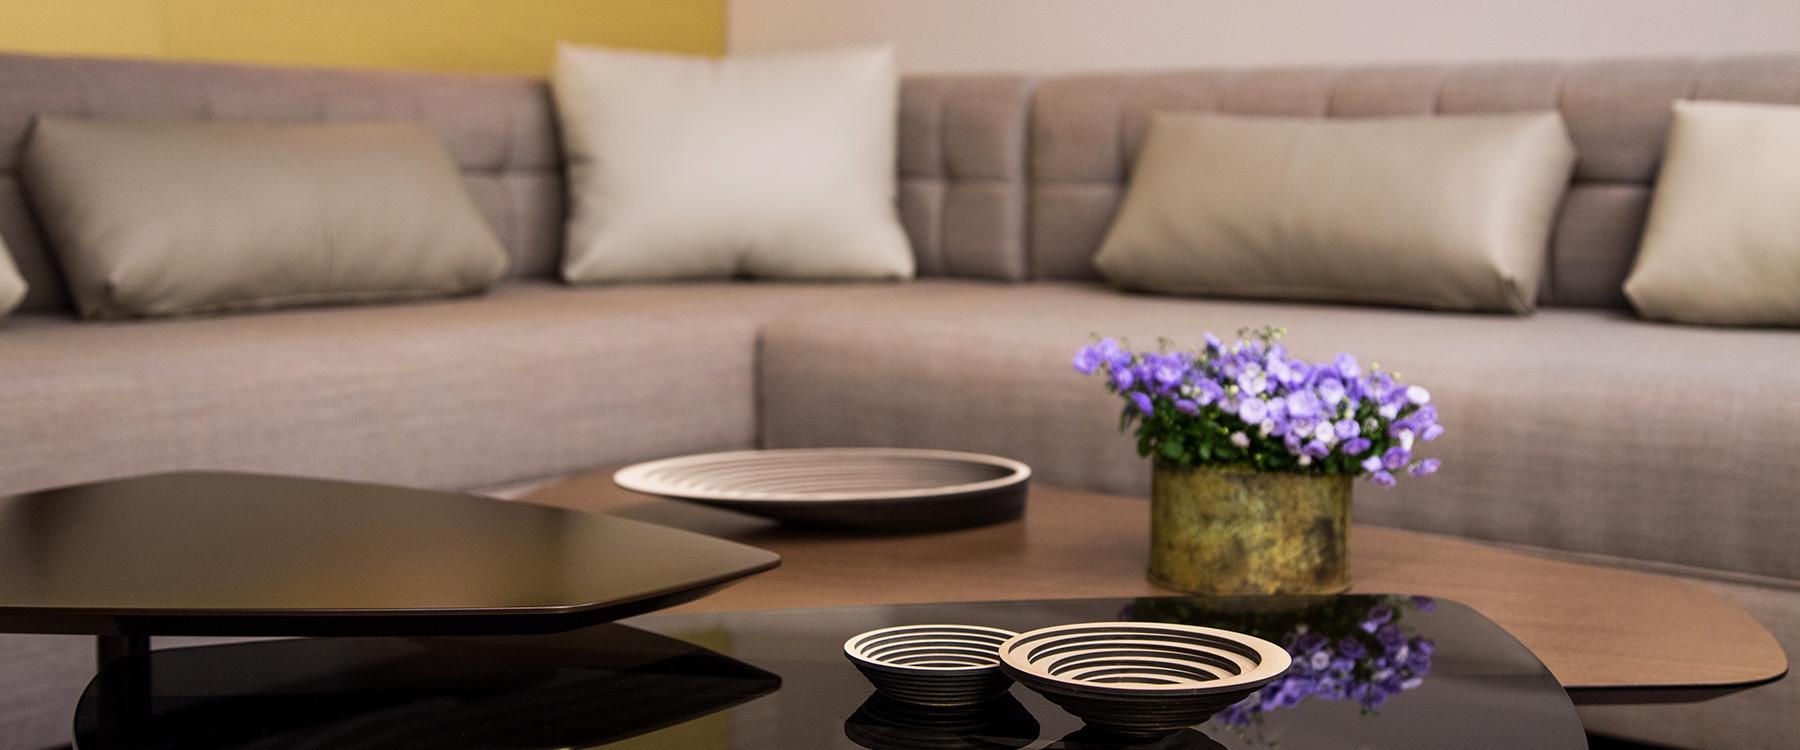 cover-accorhotels-arena-espaces-vip-design-sensoriel-materiaux-mobilier-loges-amenagement-premium